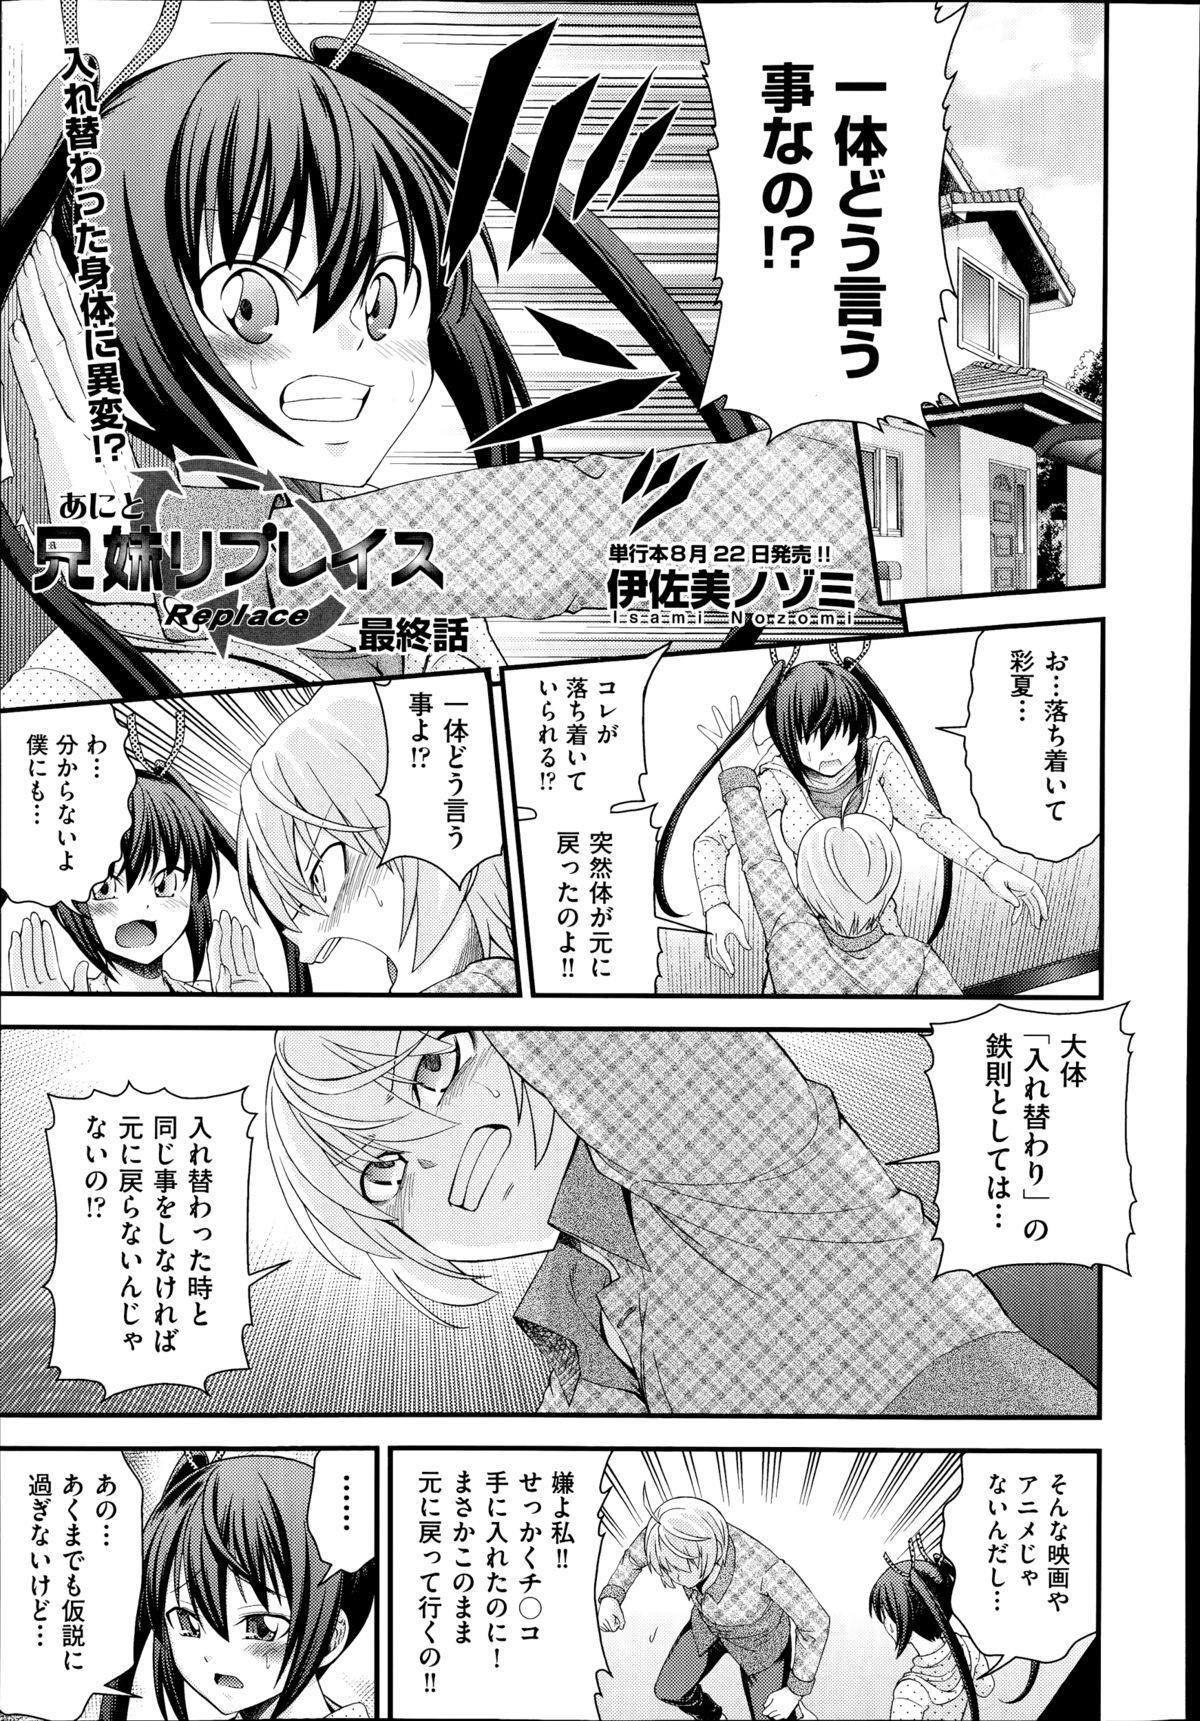 Kyoudai Replace 120